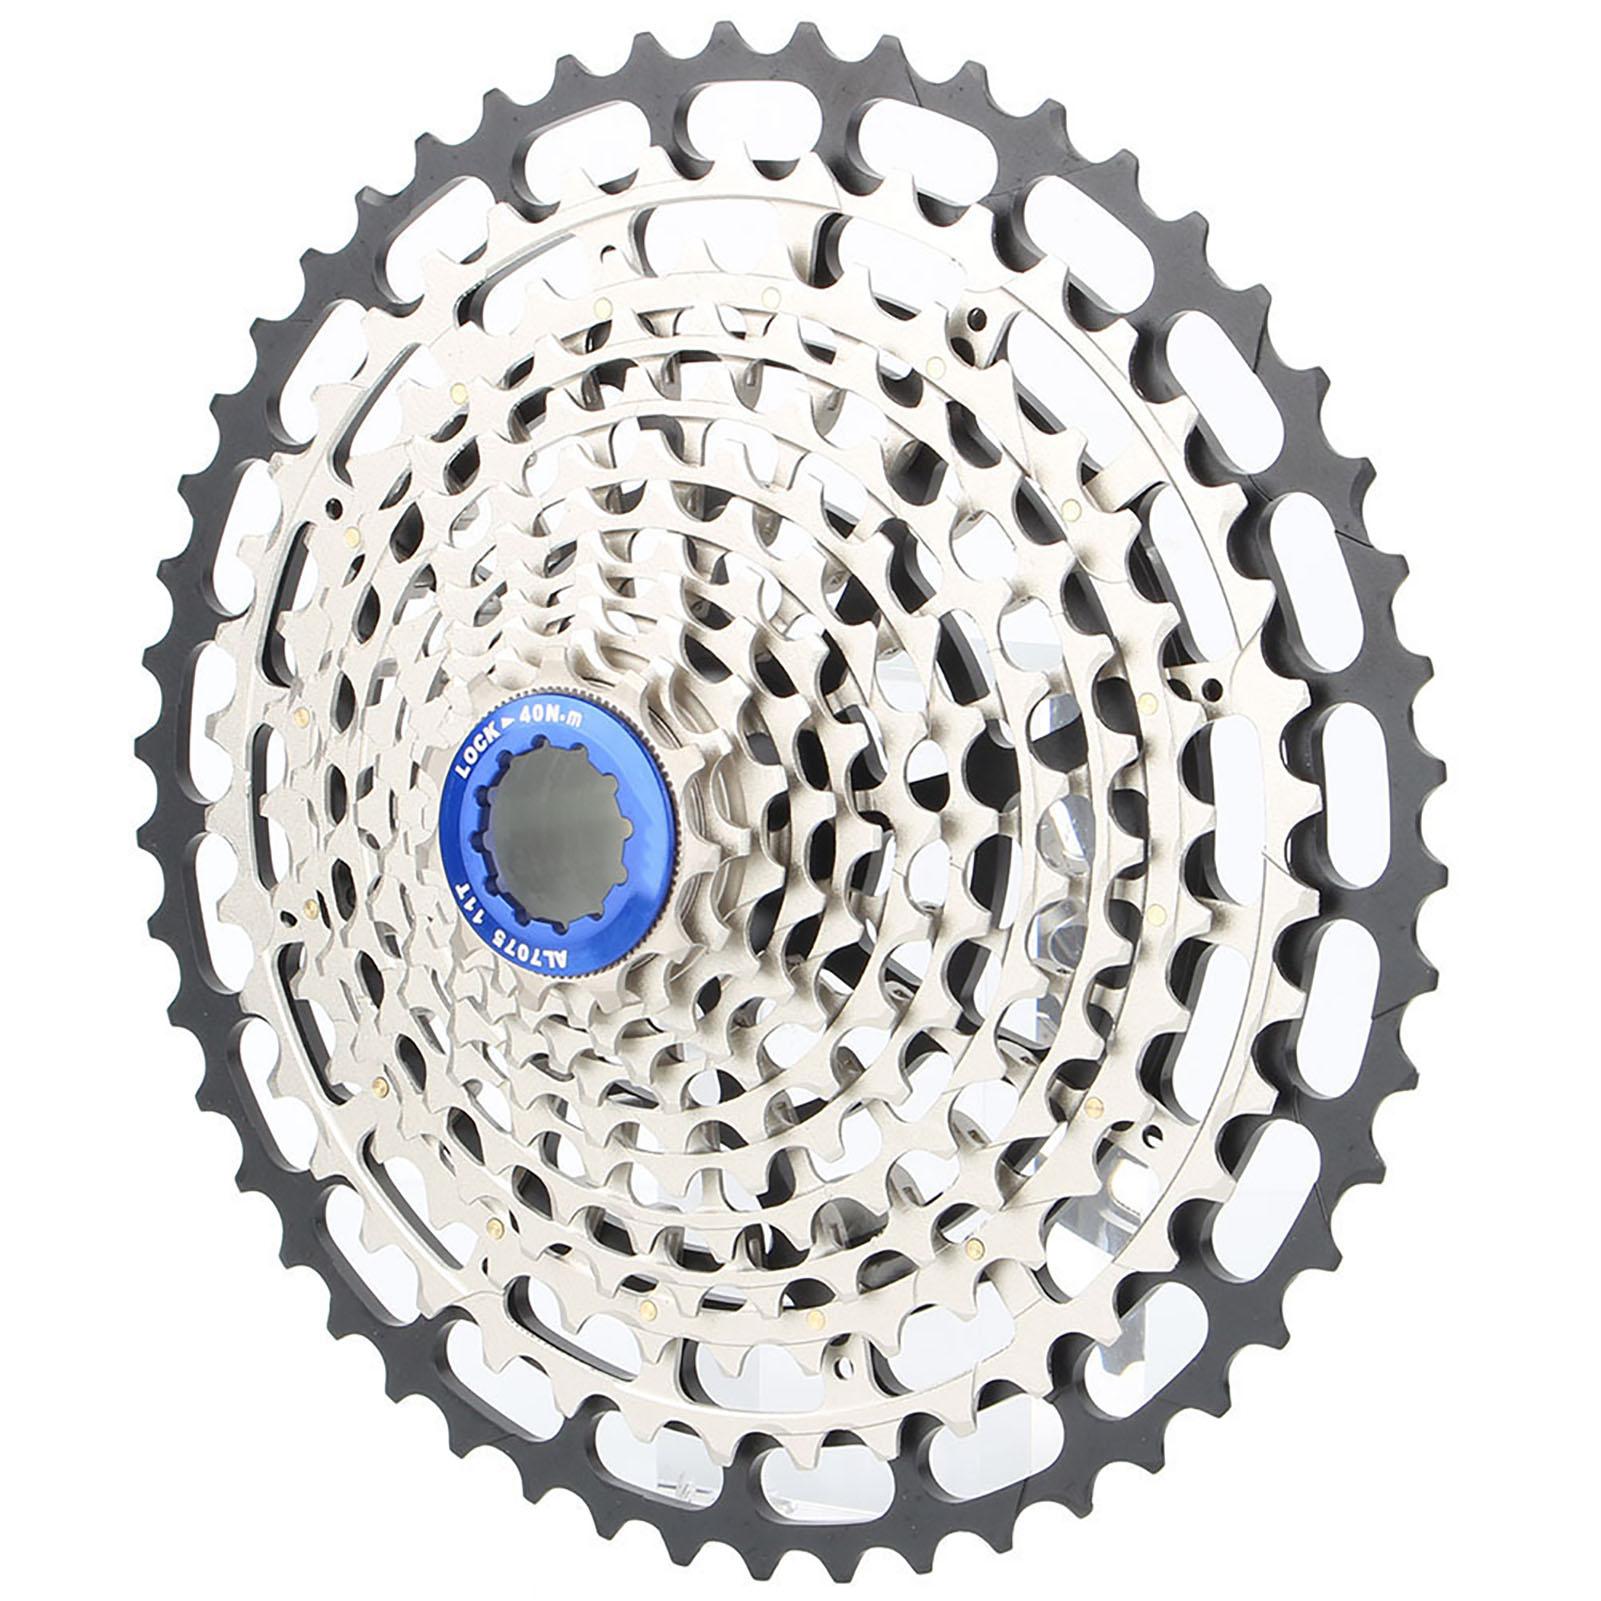 ZTTO-12-Speed-Cassette-10-50T-11-50T-Freewheel-Mountain-Bike-Sprocket-Compatible thumbnail 15